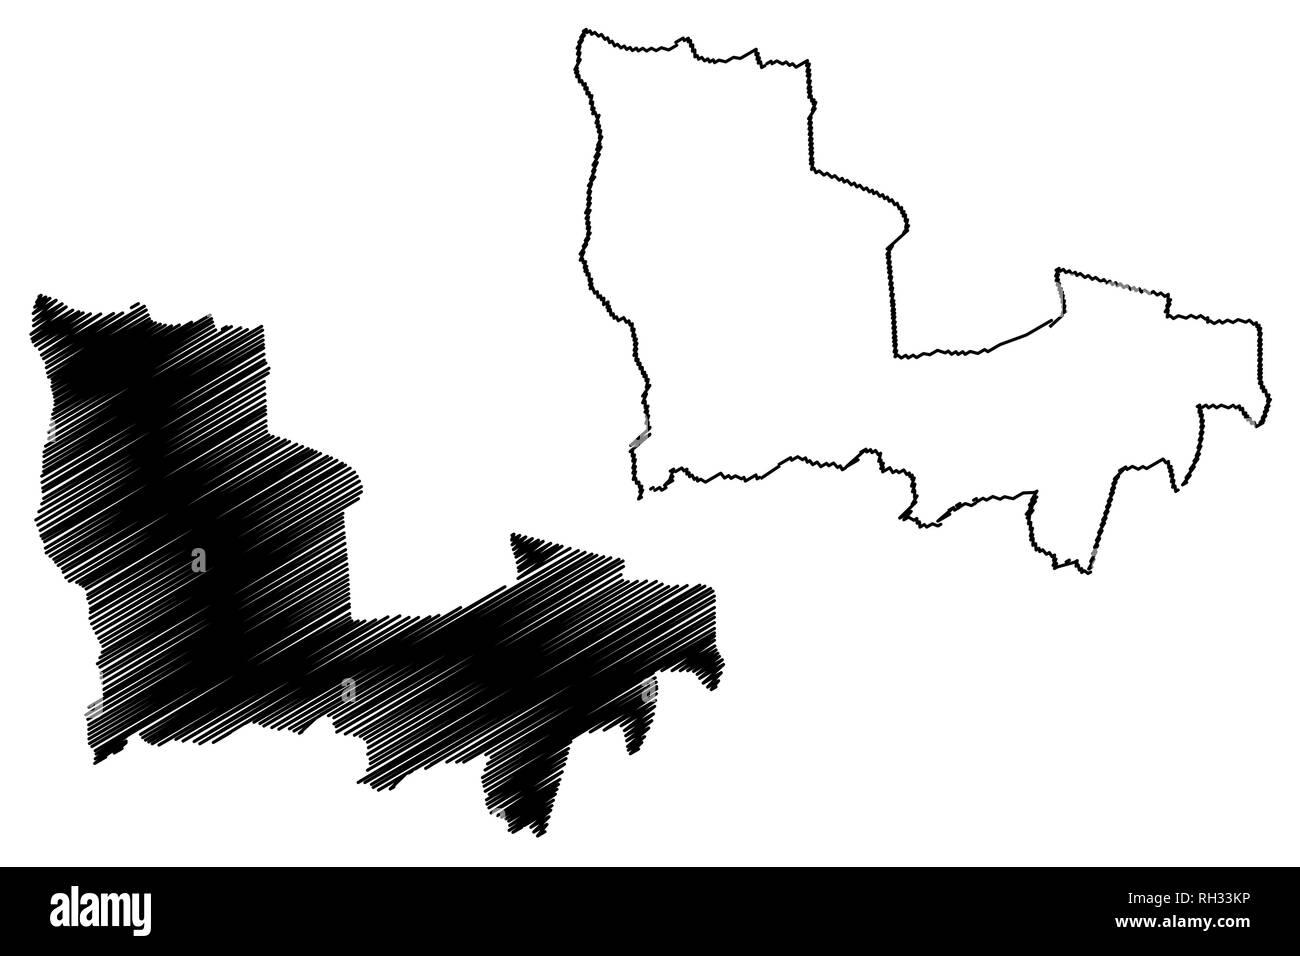 Drc Map on